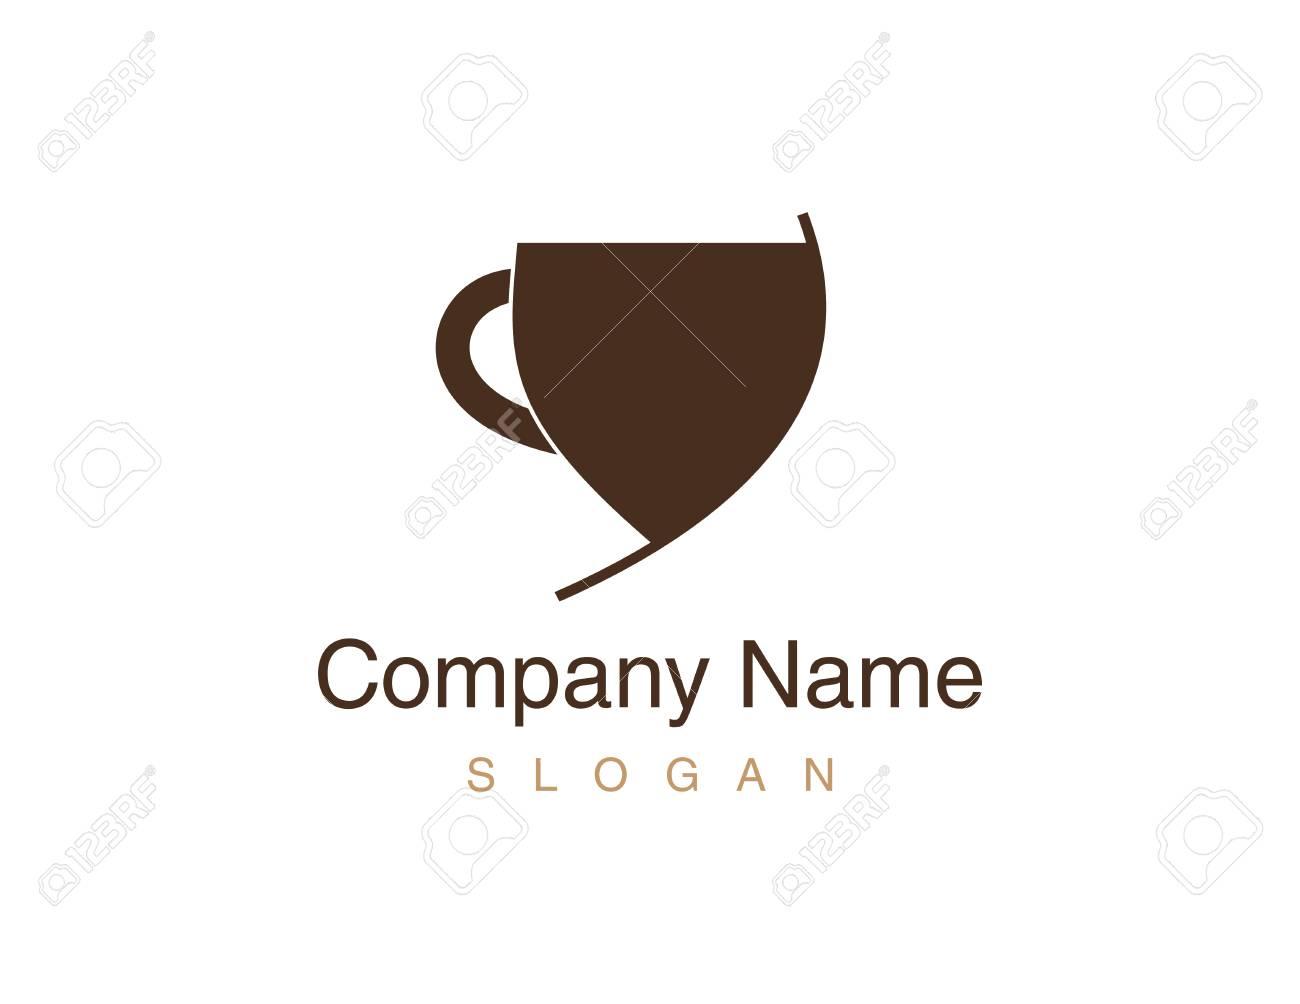 Cup coffee illustration. - 93055242